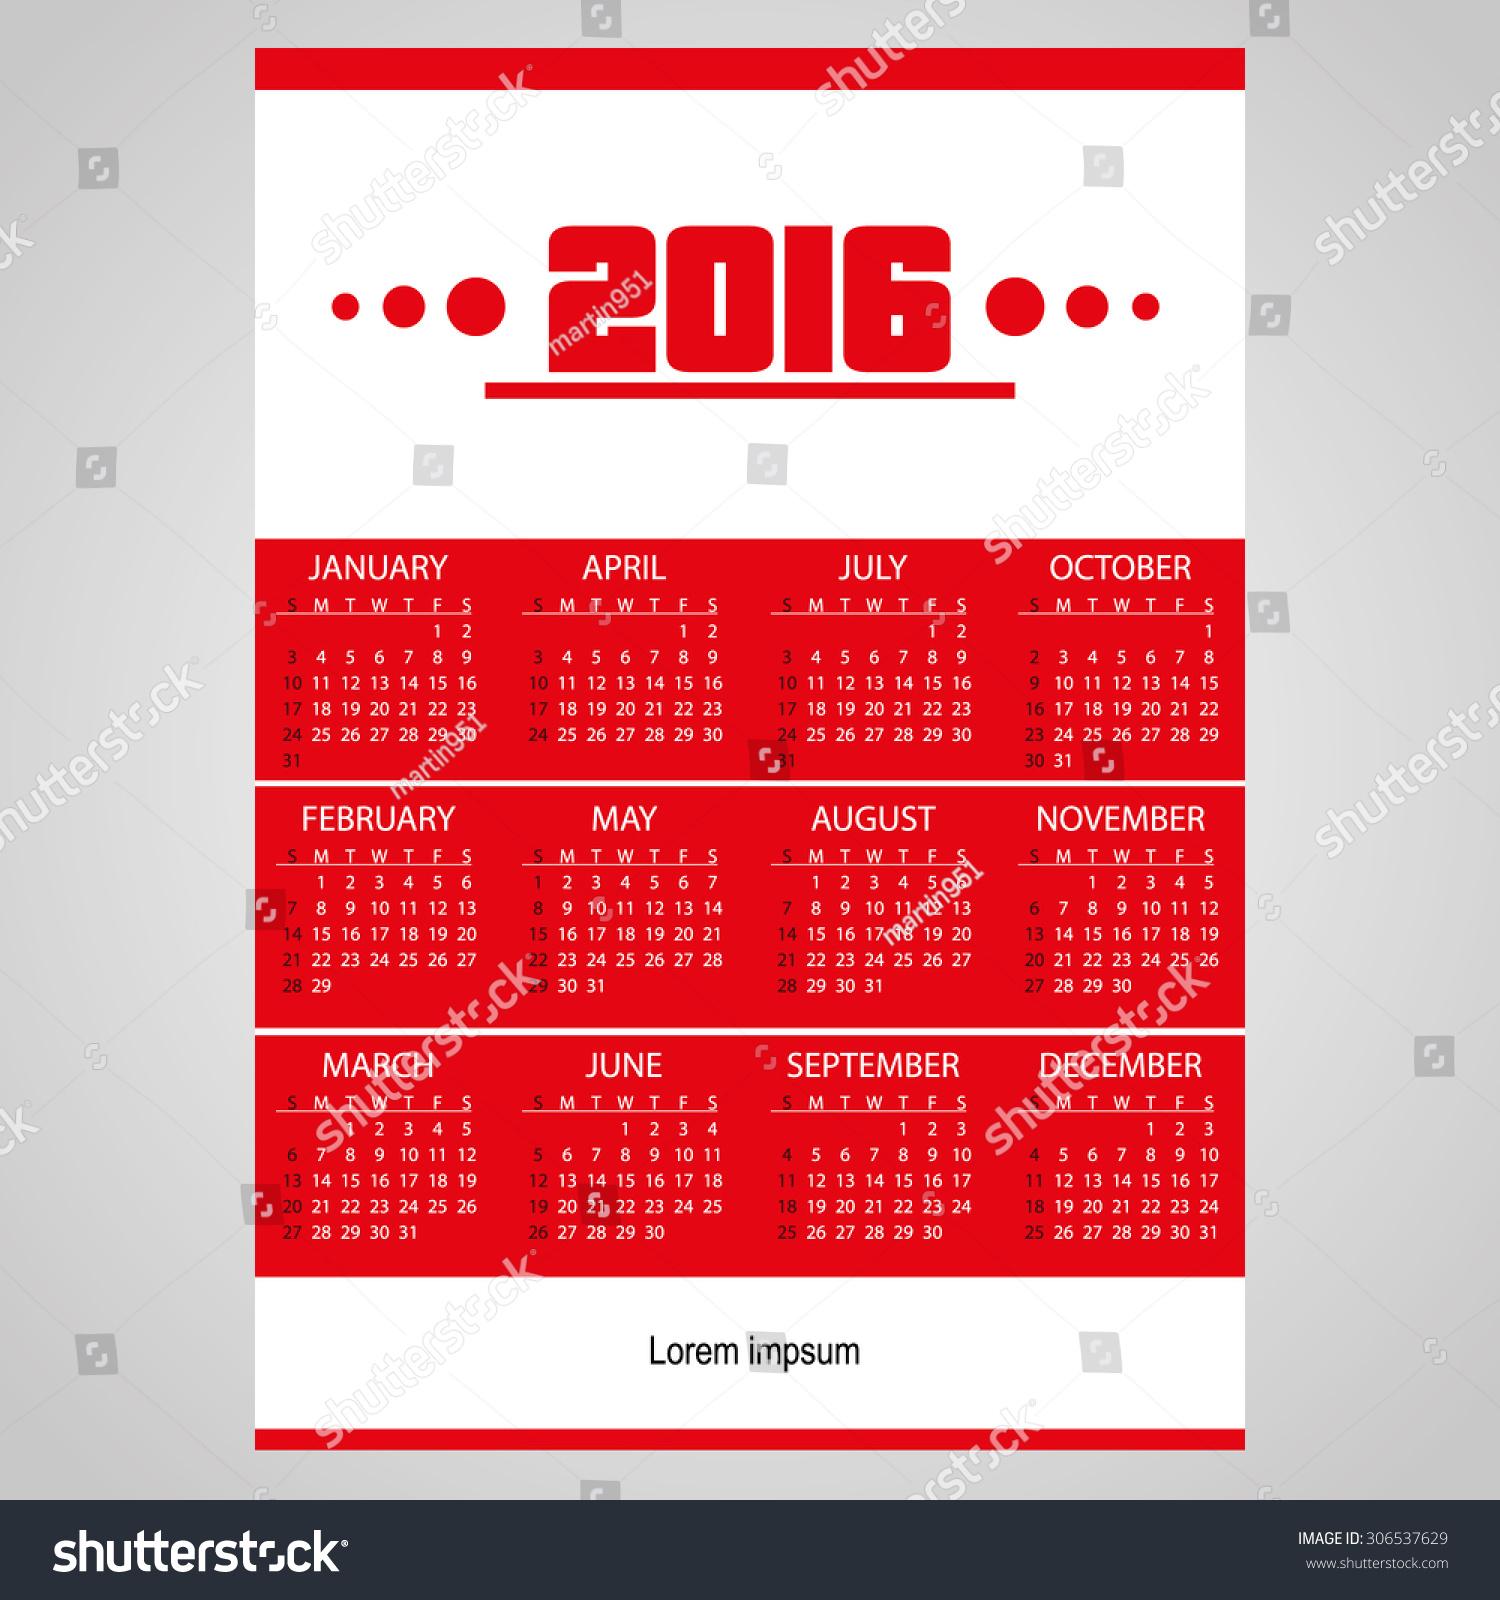 Calendar Red : Simple business red wall calendar stock vector